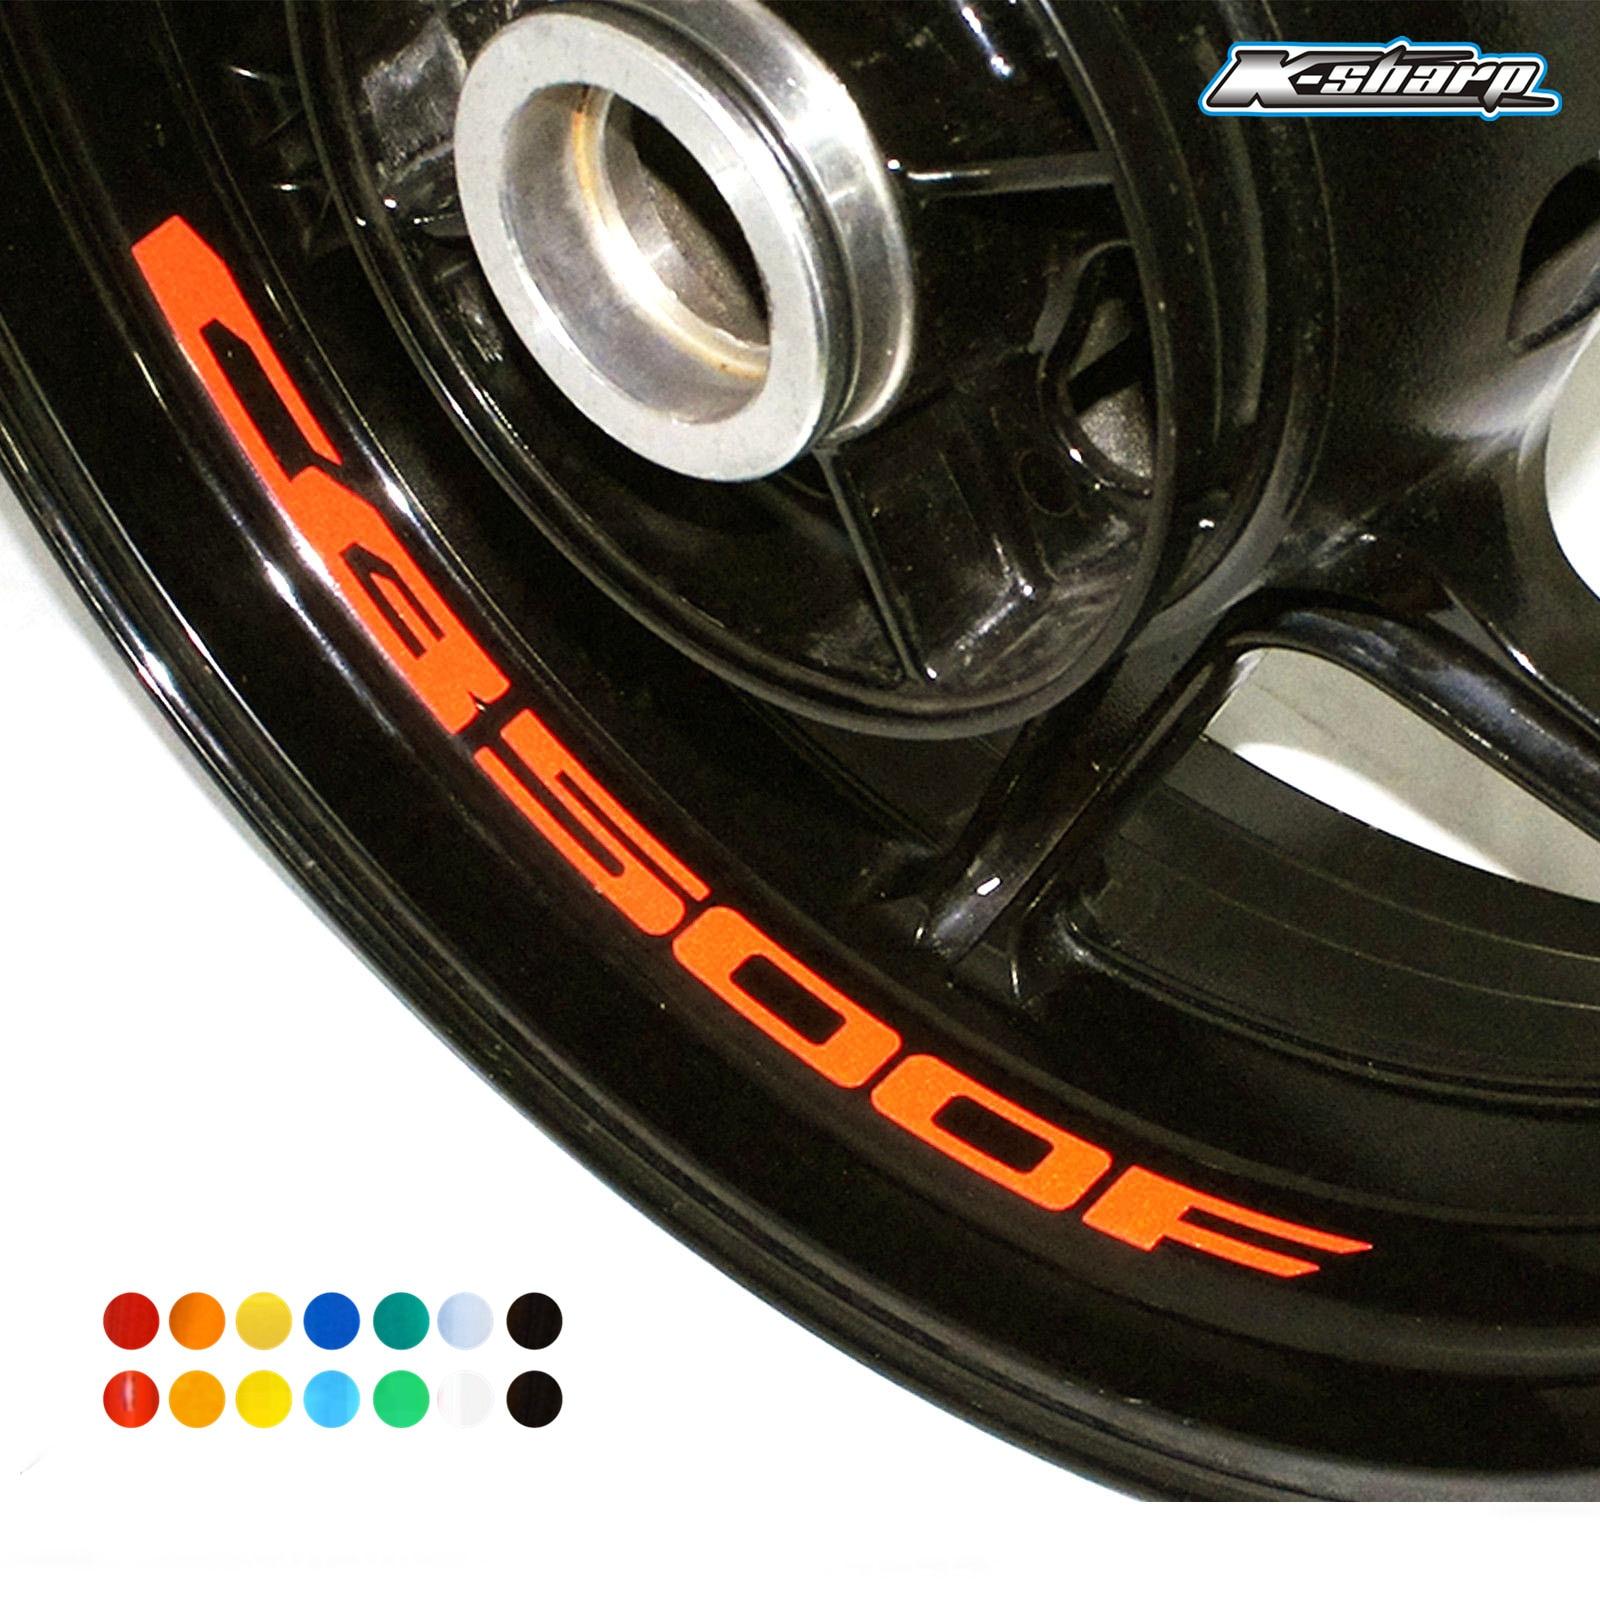 8 X Custon Inner Rim Decals Wheel Reflective Sign Stickers Stripes FIT HONDA CB500F